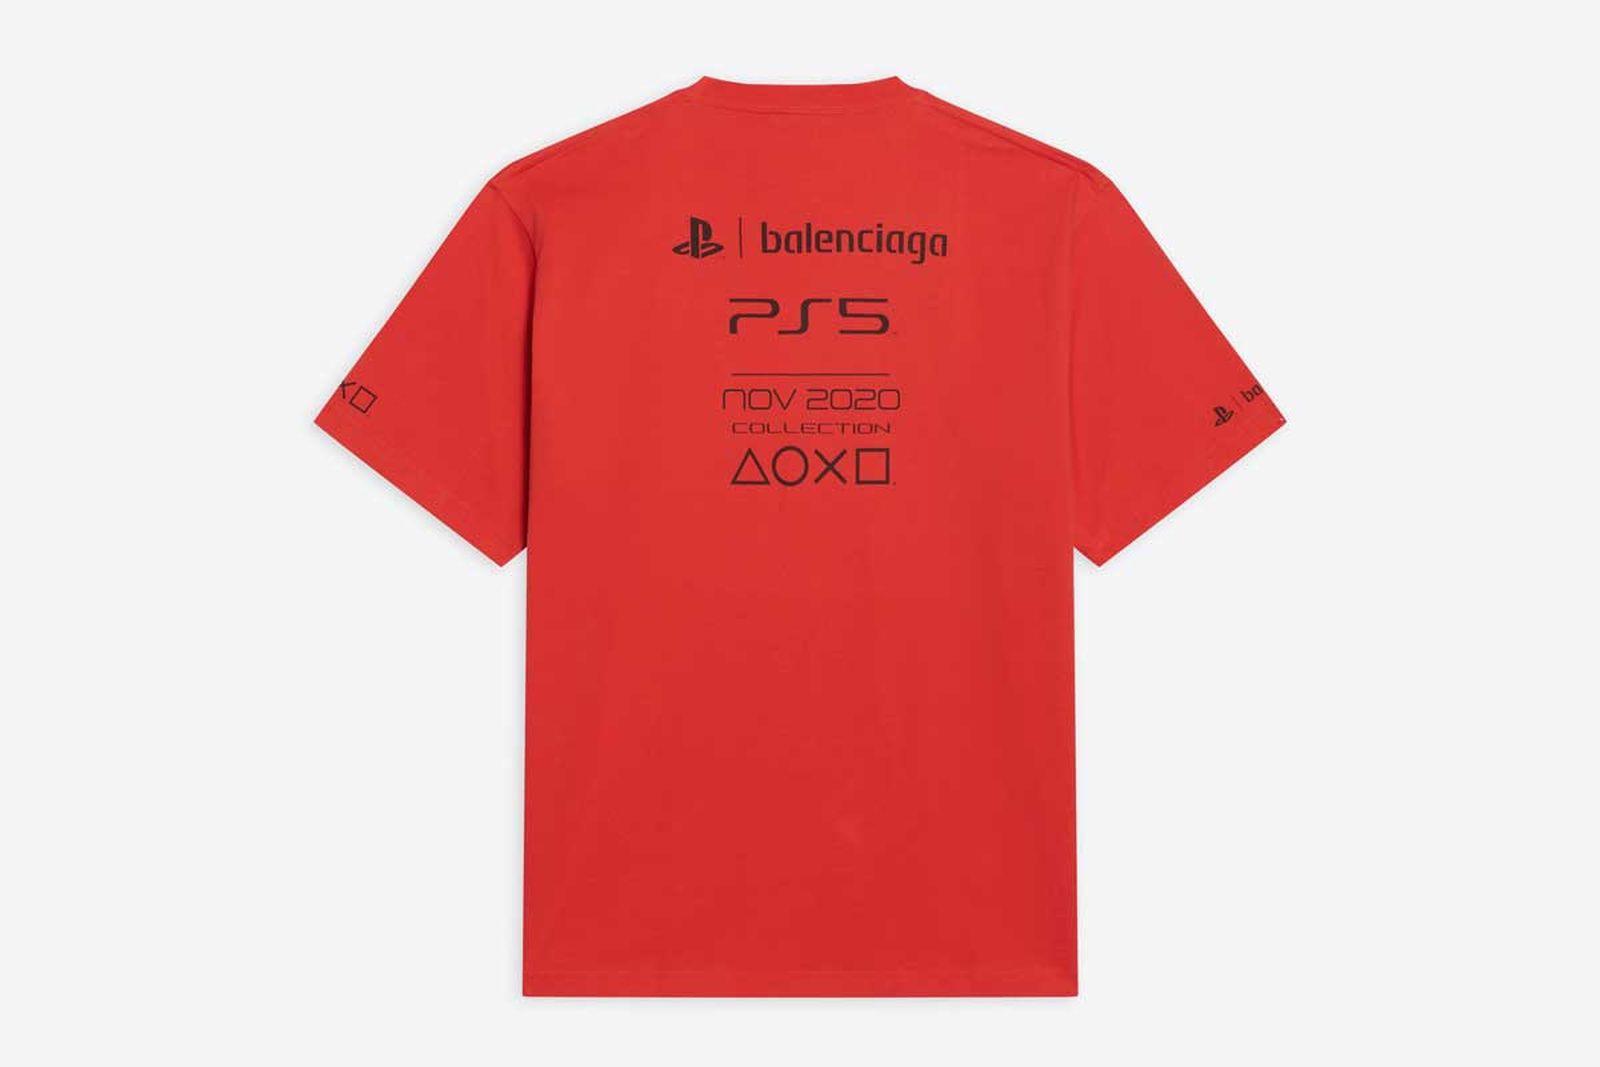 balenciaga-sony-playstaton-5-collab-(41)